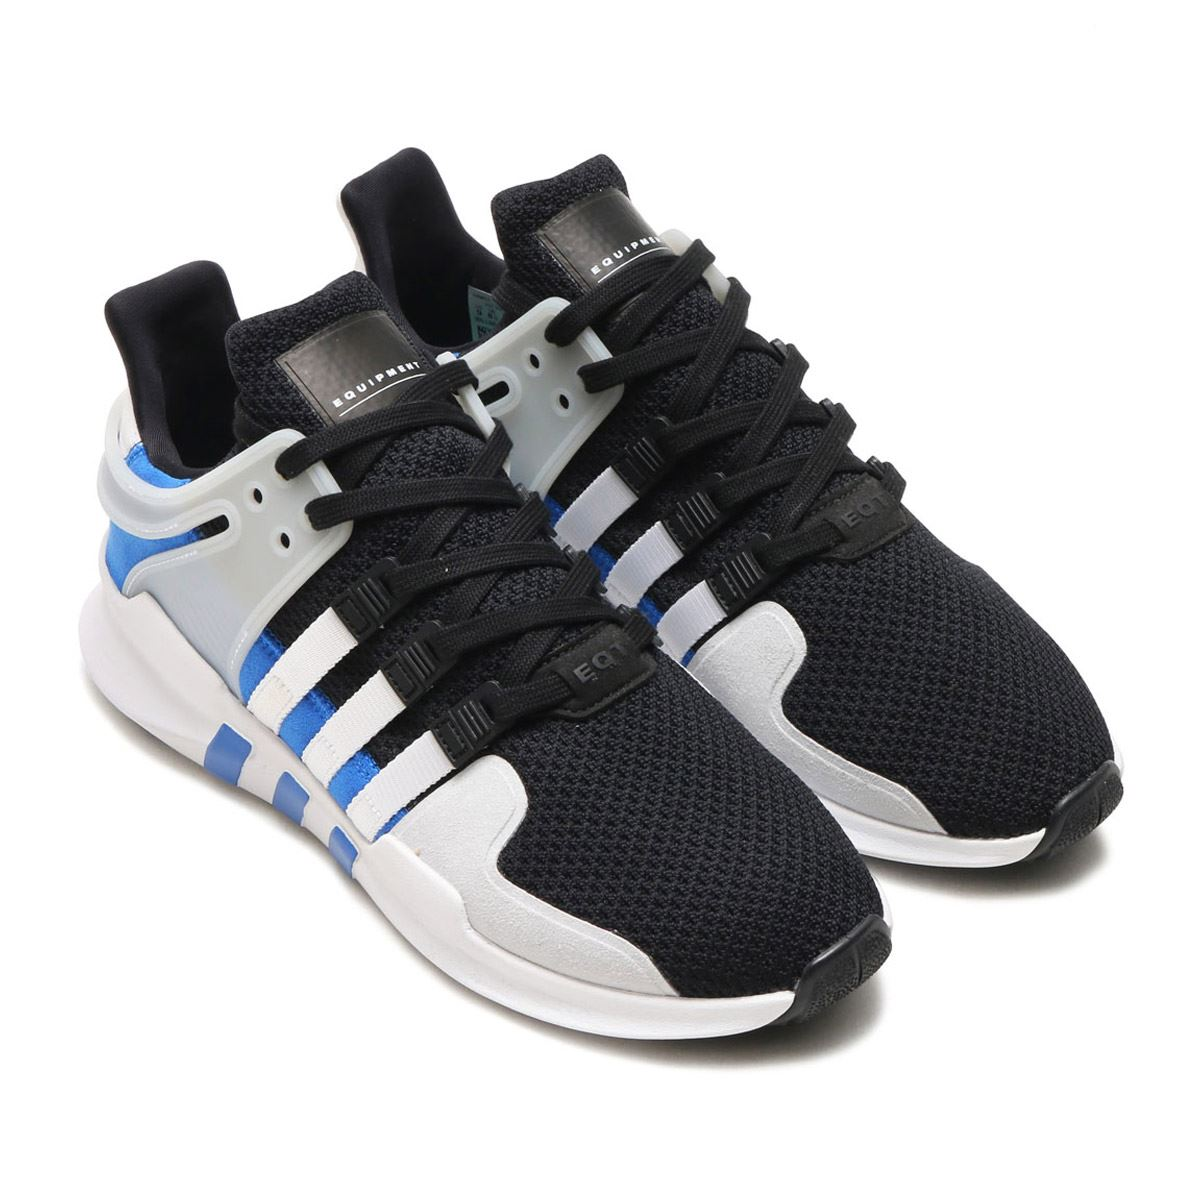 adidas-EQT-Support-ADV-Mens-Trainers-Originals-RRP-90-SAVE-039-S-MOST-SIZES miniatuur 8